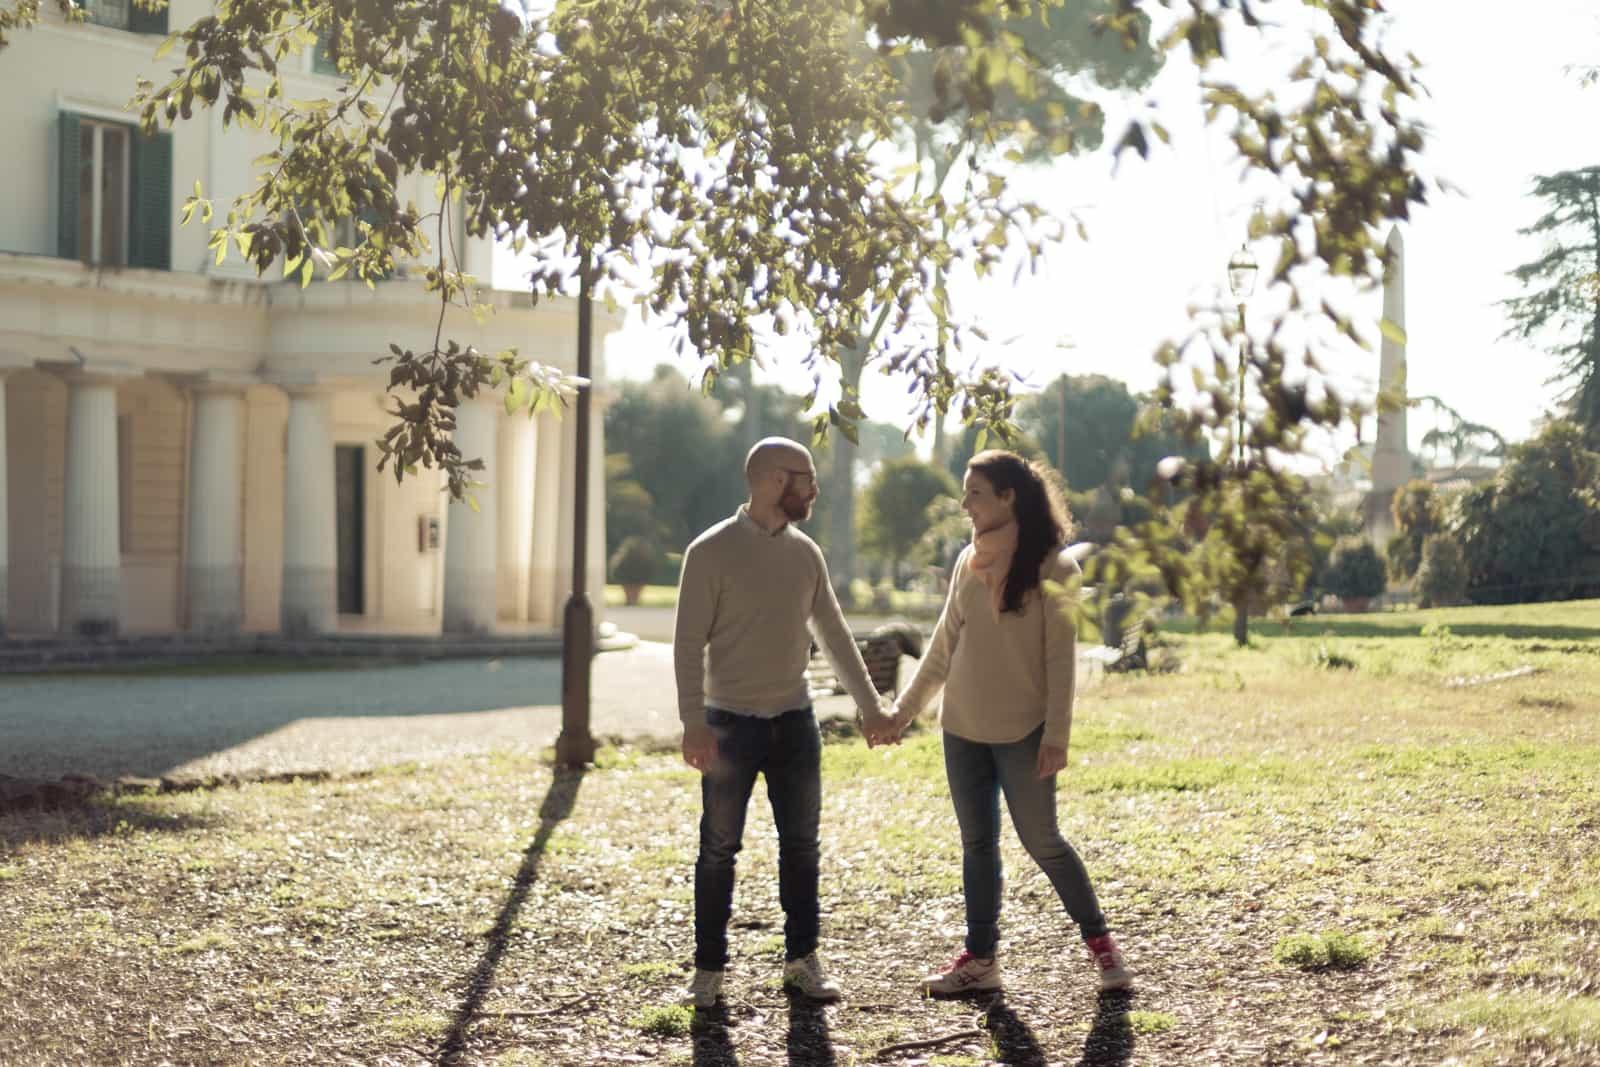 foto prematrimoniali8 - Engagement in Rome